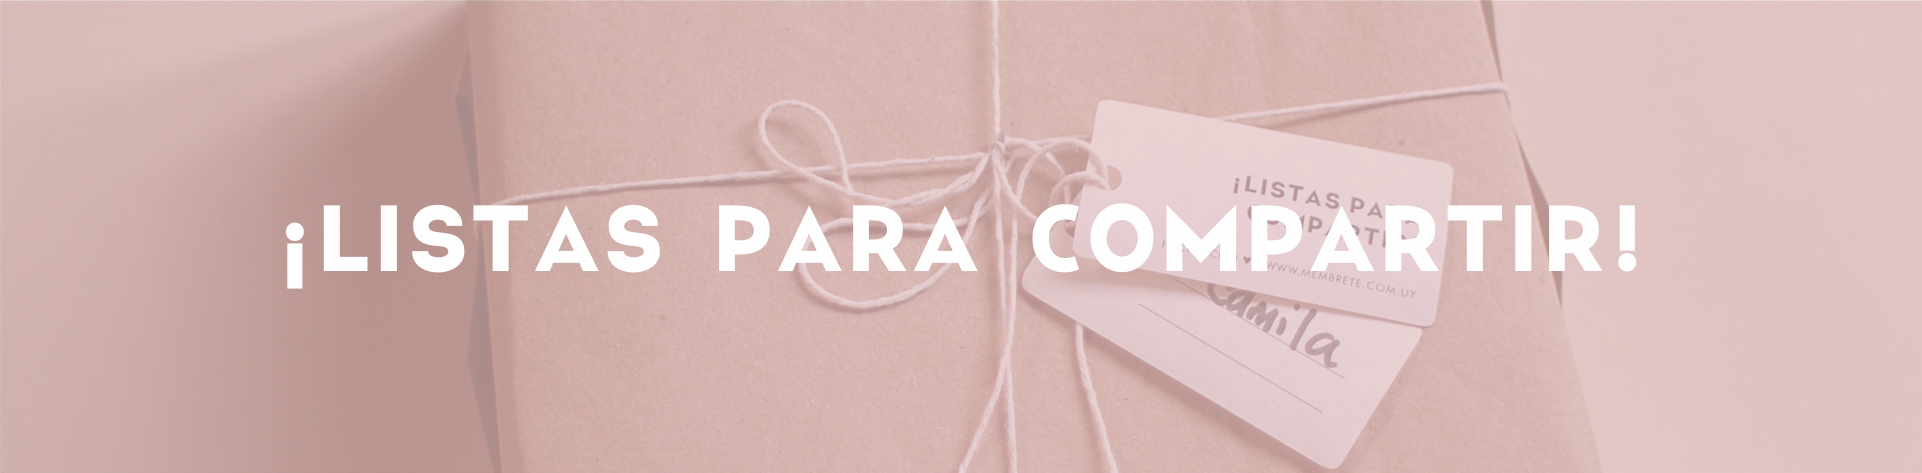 listasparacompartr-banner-2017.png